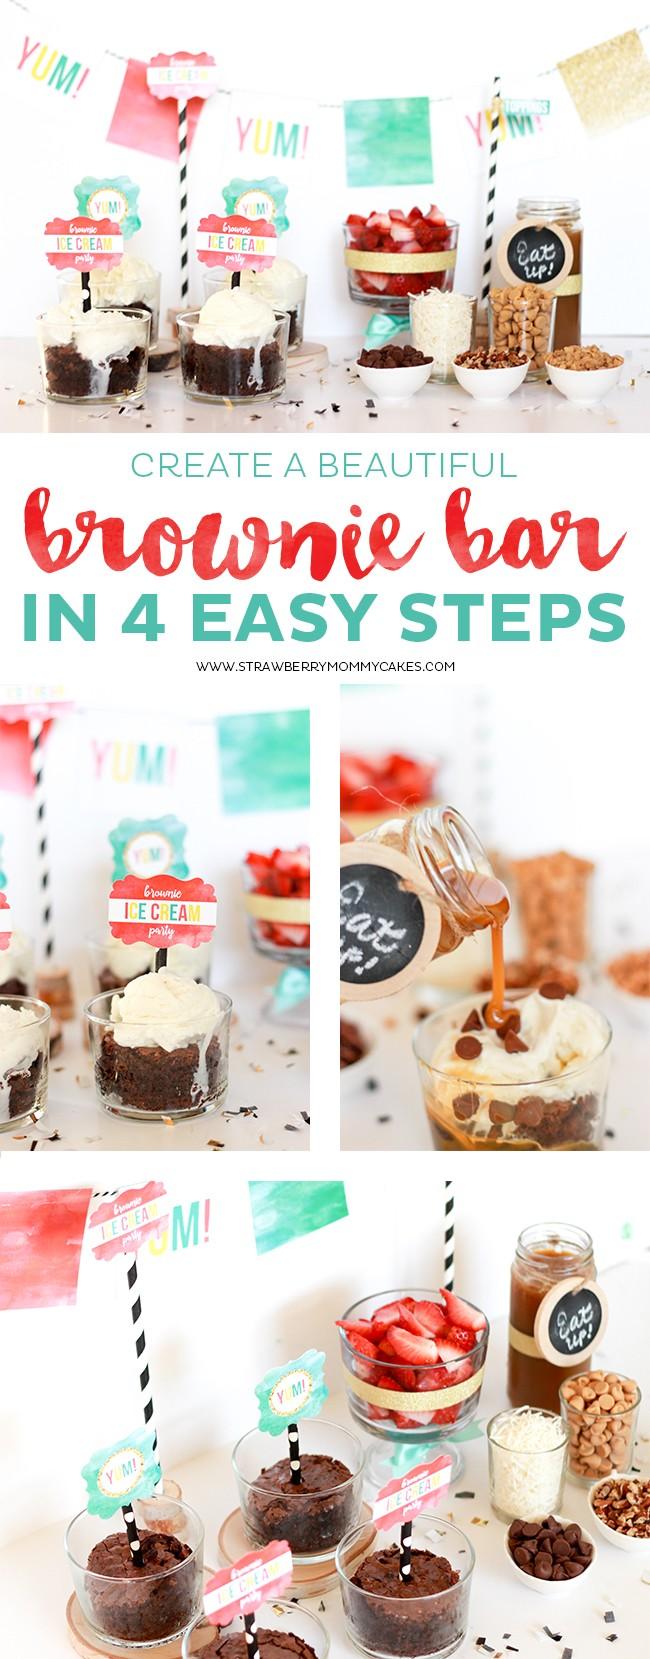 Create a Beautiful Brownie Bar in 3 Easy Steps!